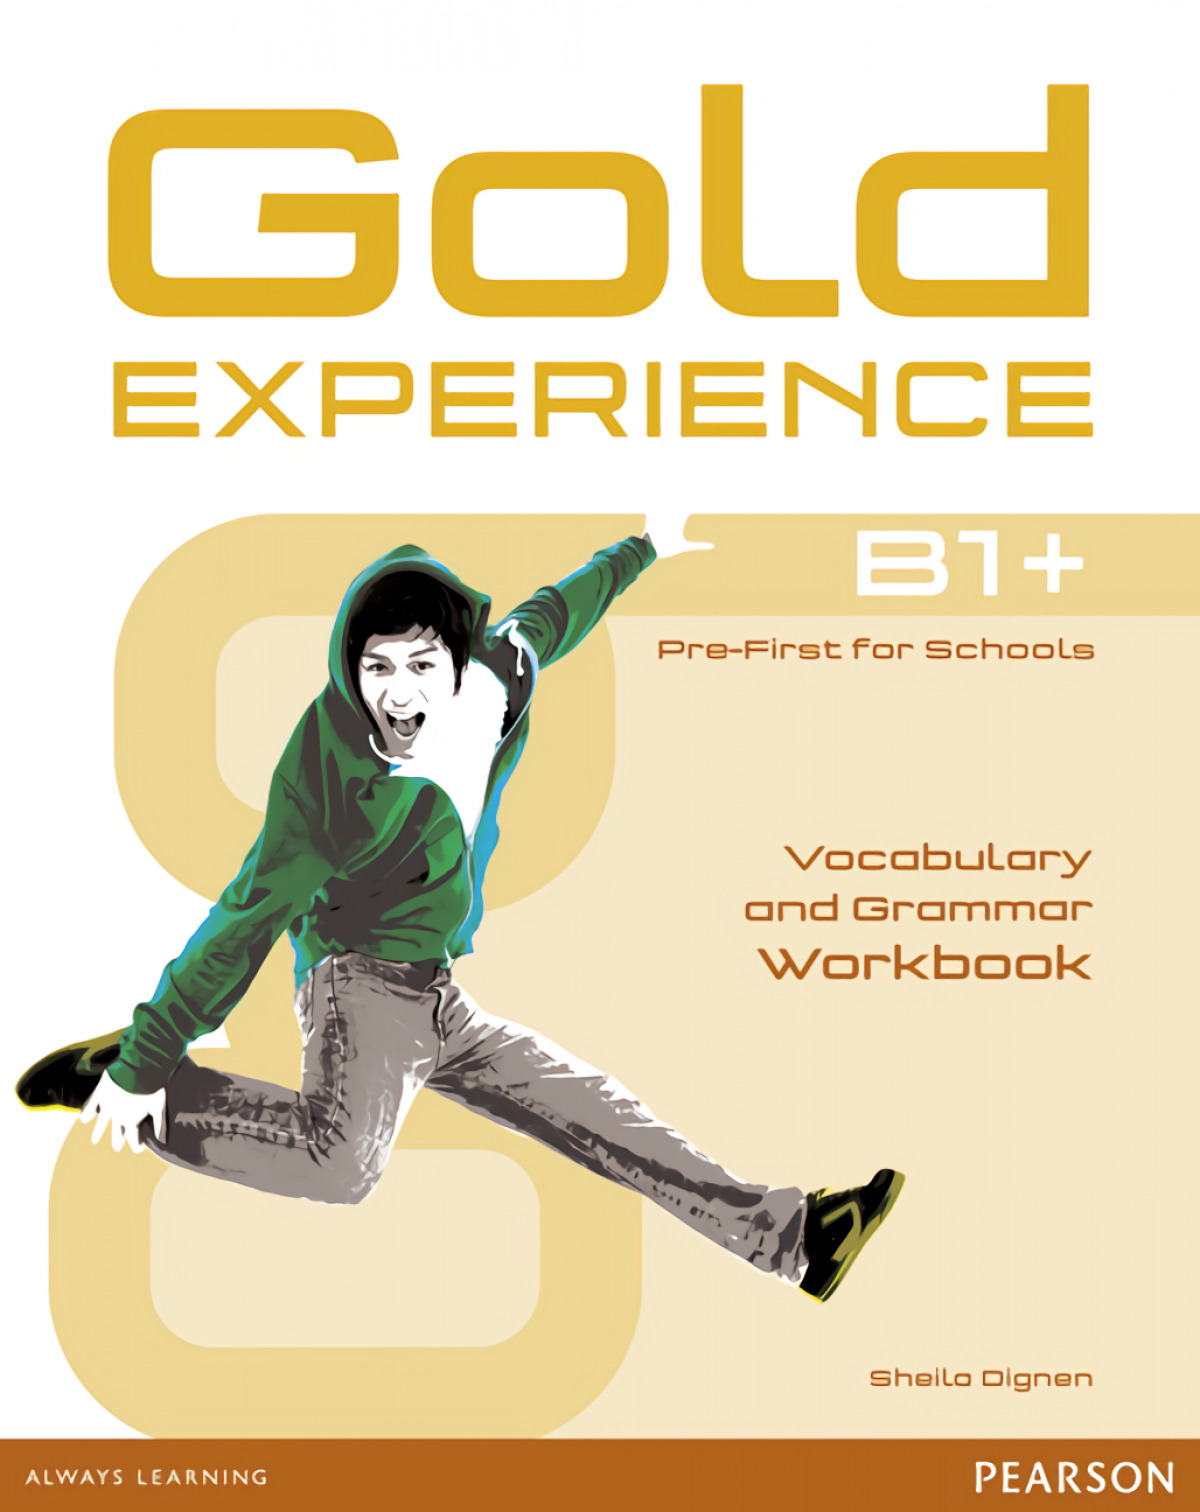 Gold experience B1+ workbook -key